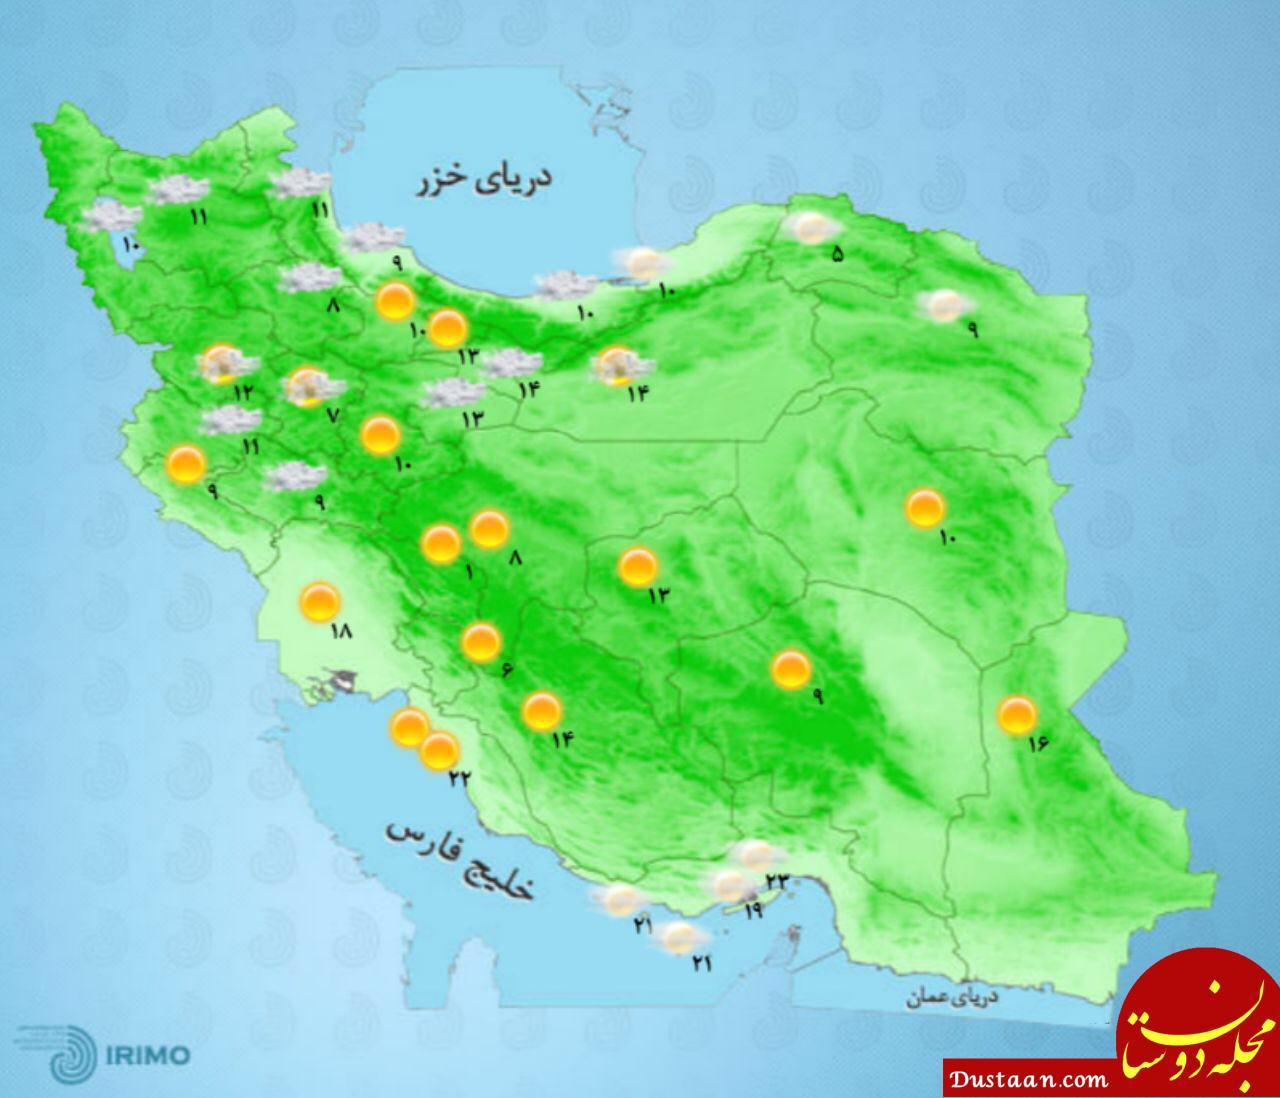 www.dustaan.com پیشبینی جو آرام تا دوم نوروز ۹۷ +نقشه